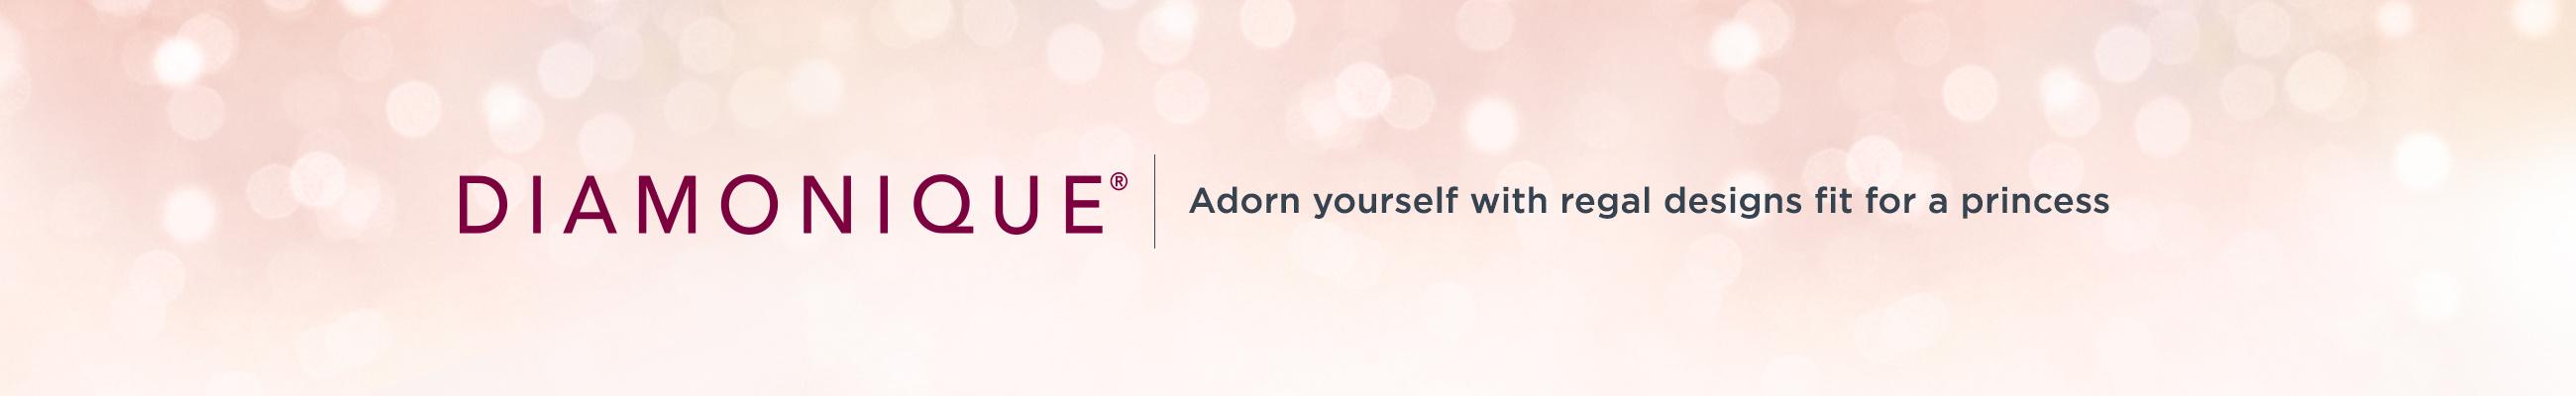 Diamonique®. Adorn yourself with regal designs fit for a princess